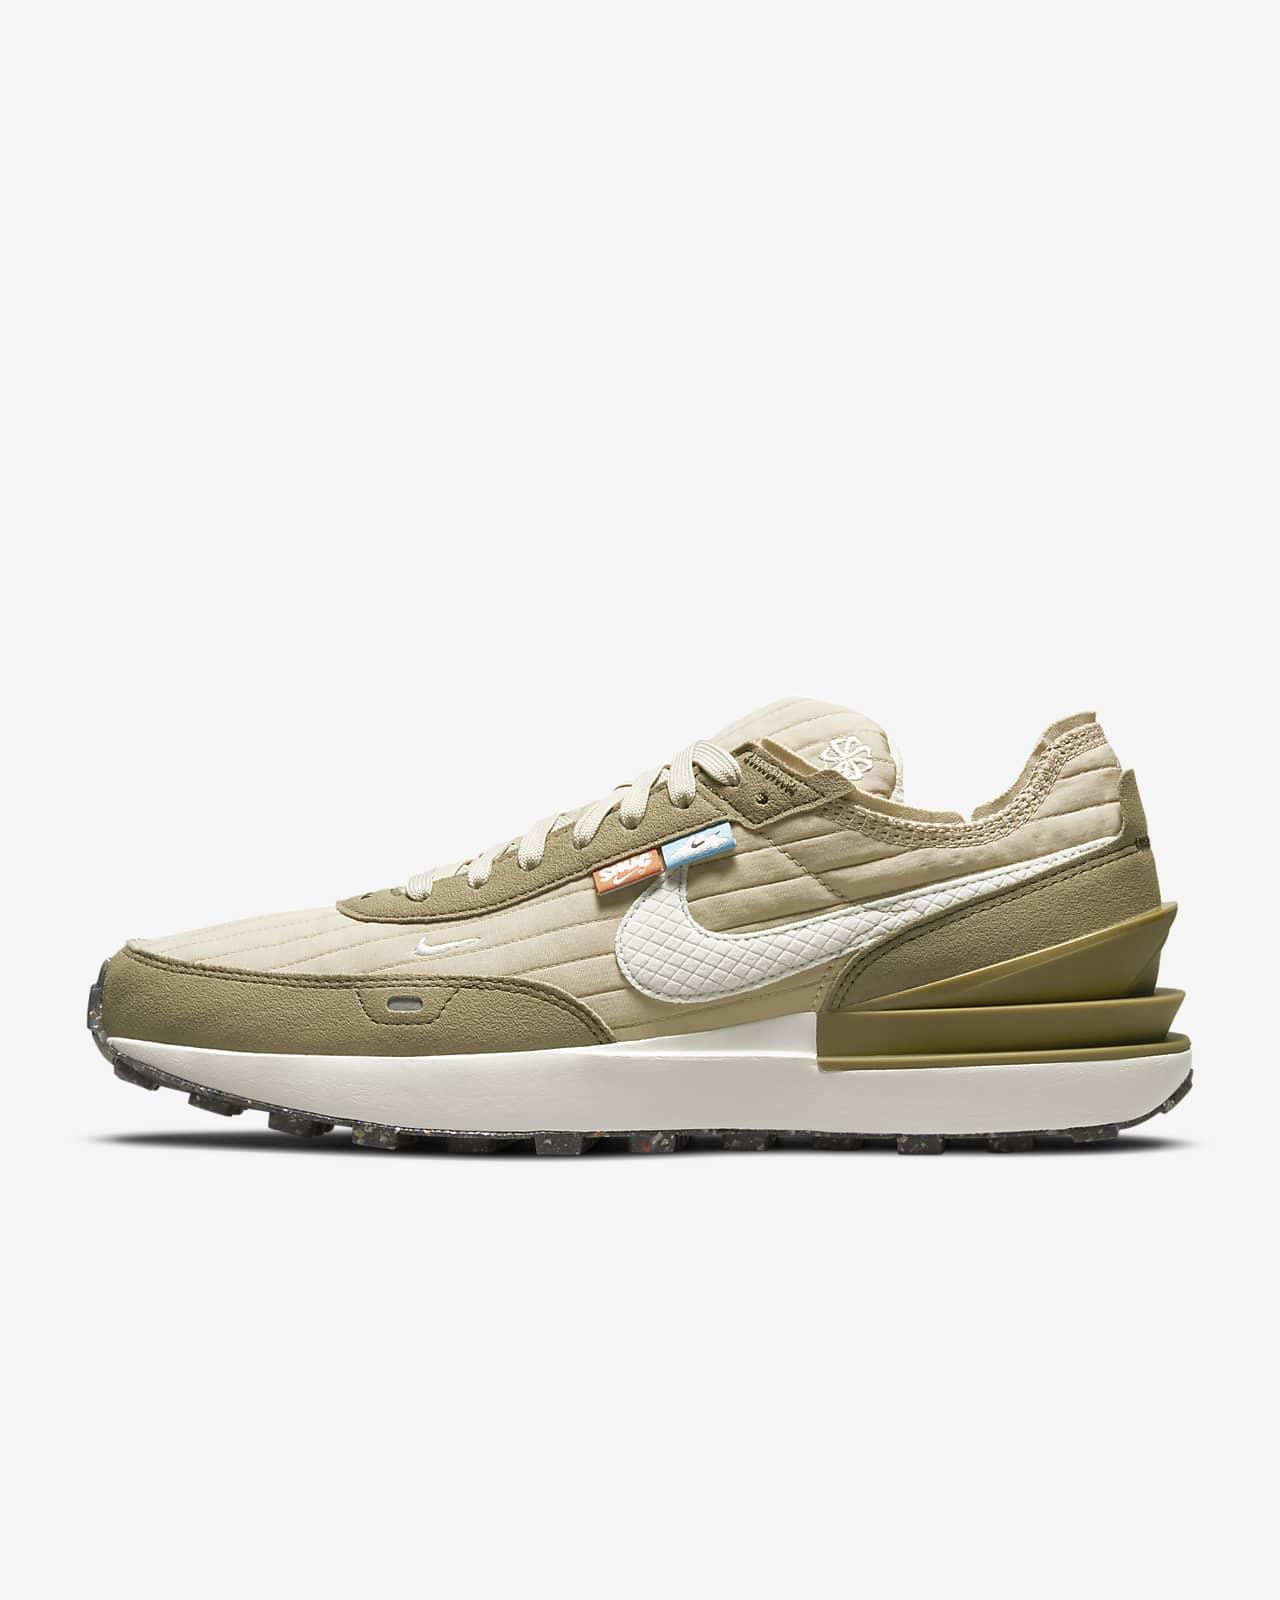 Nike Waffle One Premium Men's Shoes